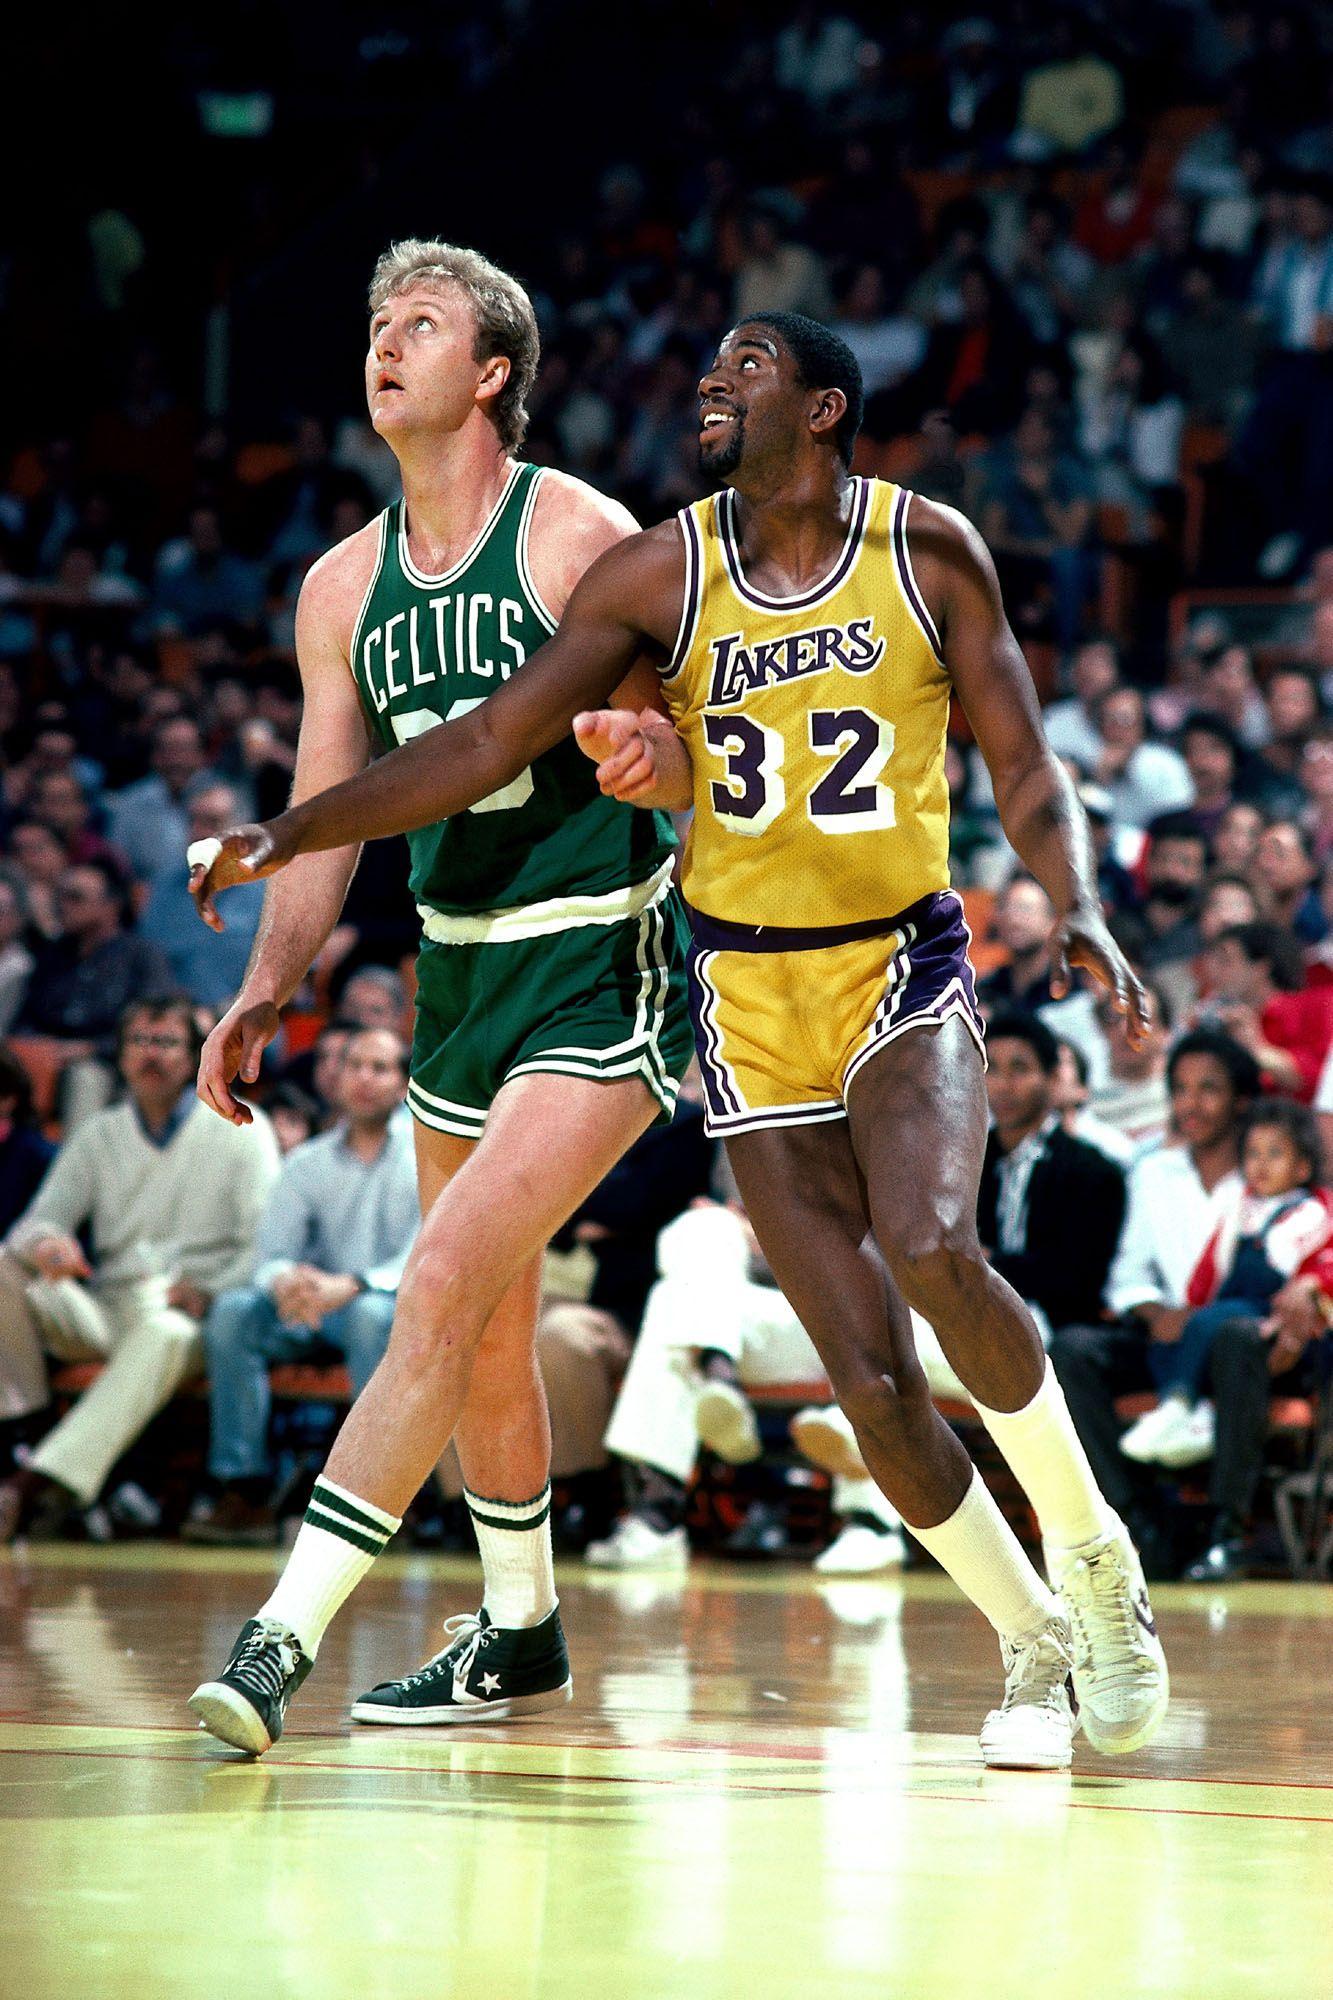 Lakers vs. Celtics (Magic vs. Bird era, 80s): Another case ...